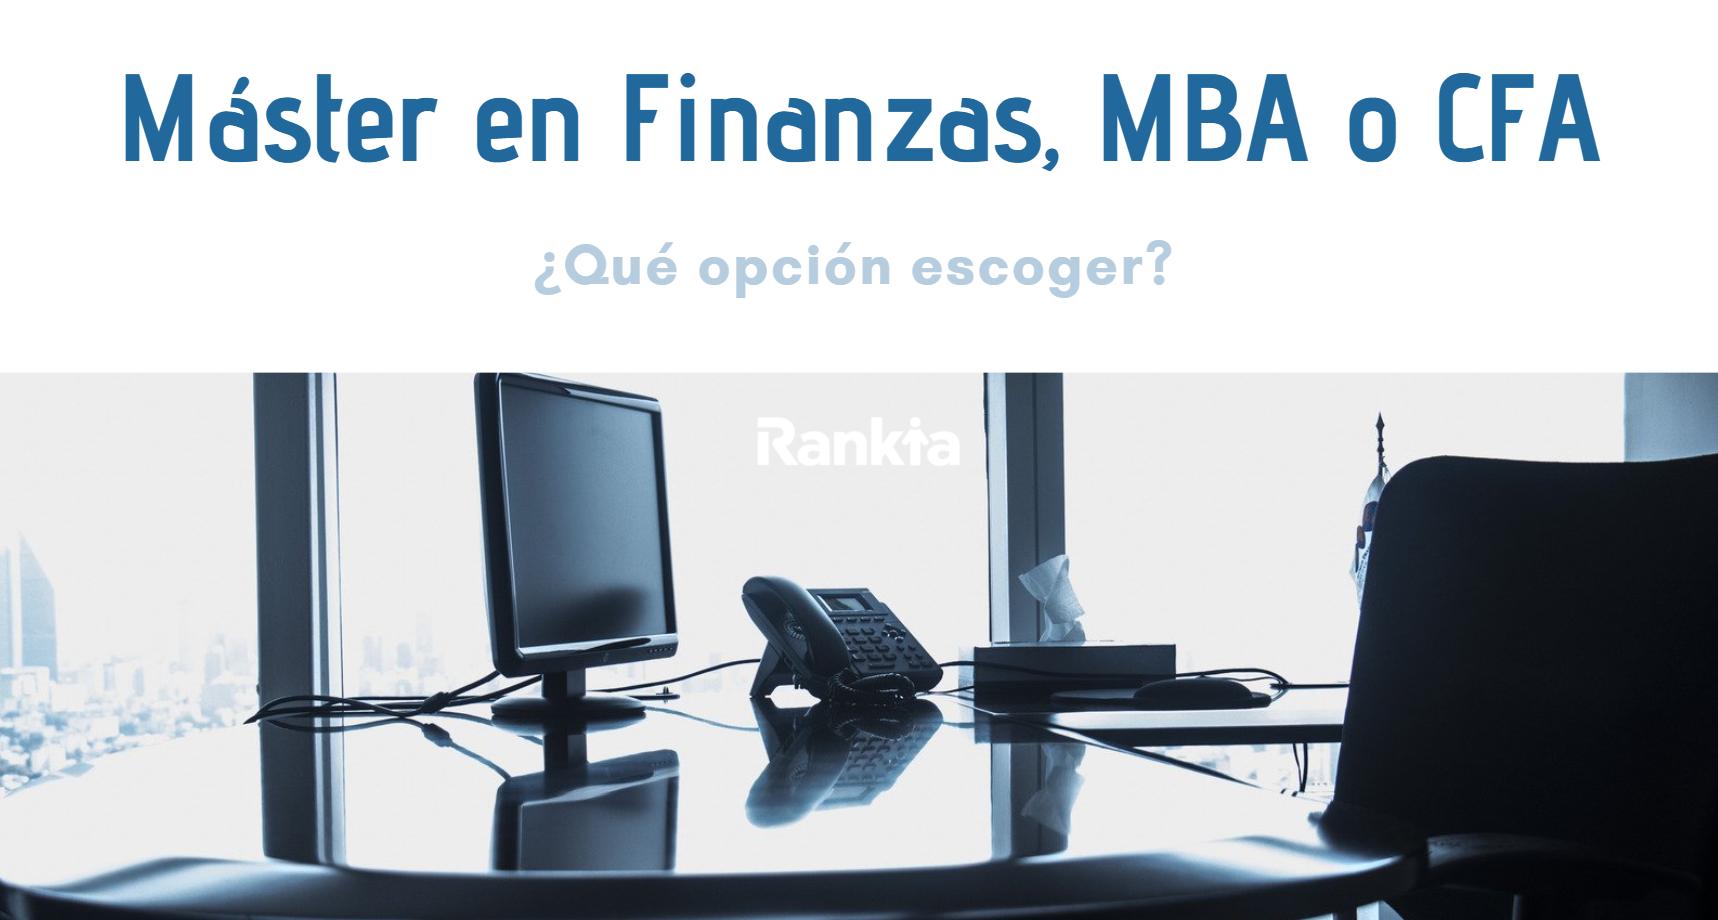 Máster en Finanzas, MBA o CFA